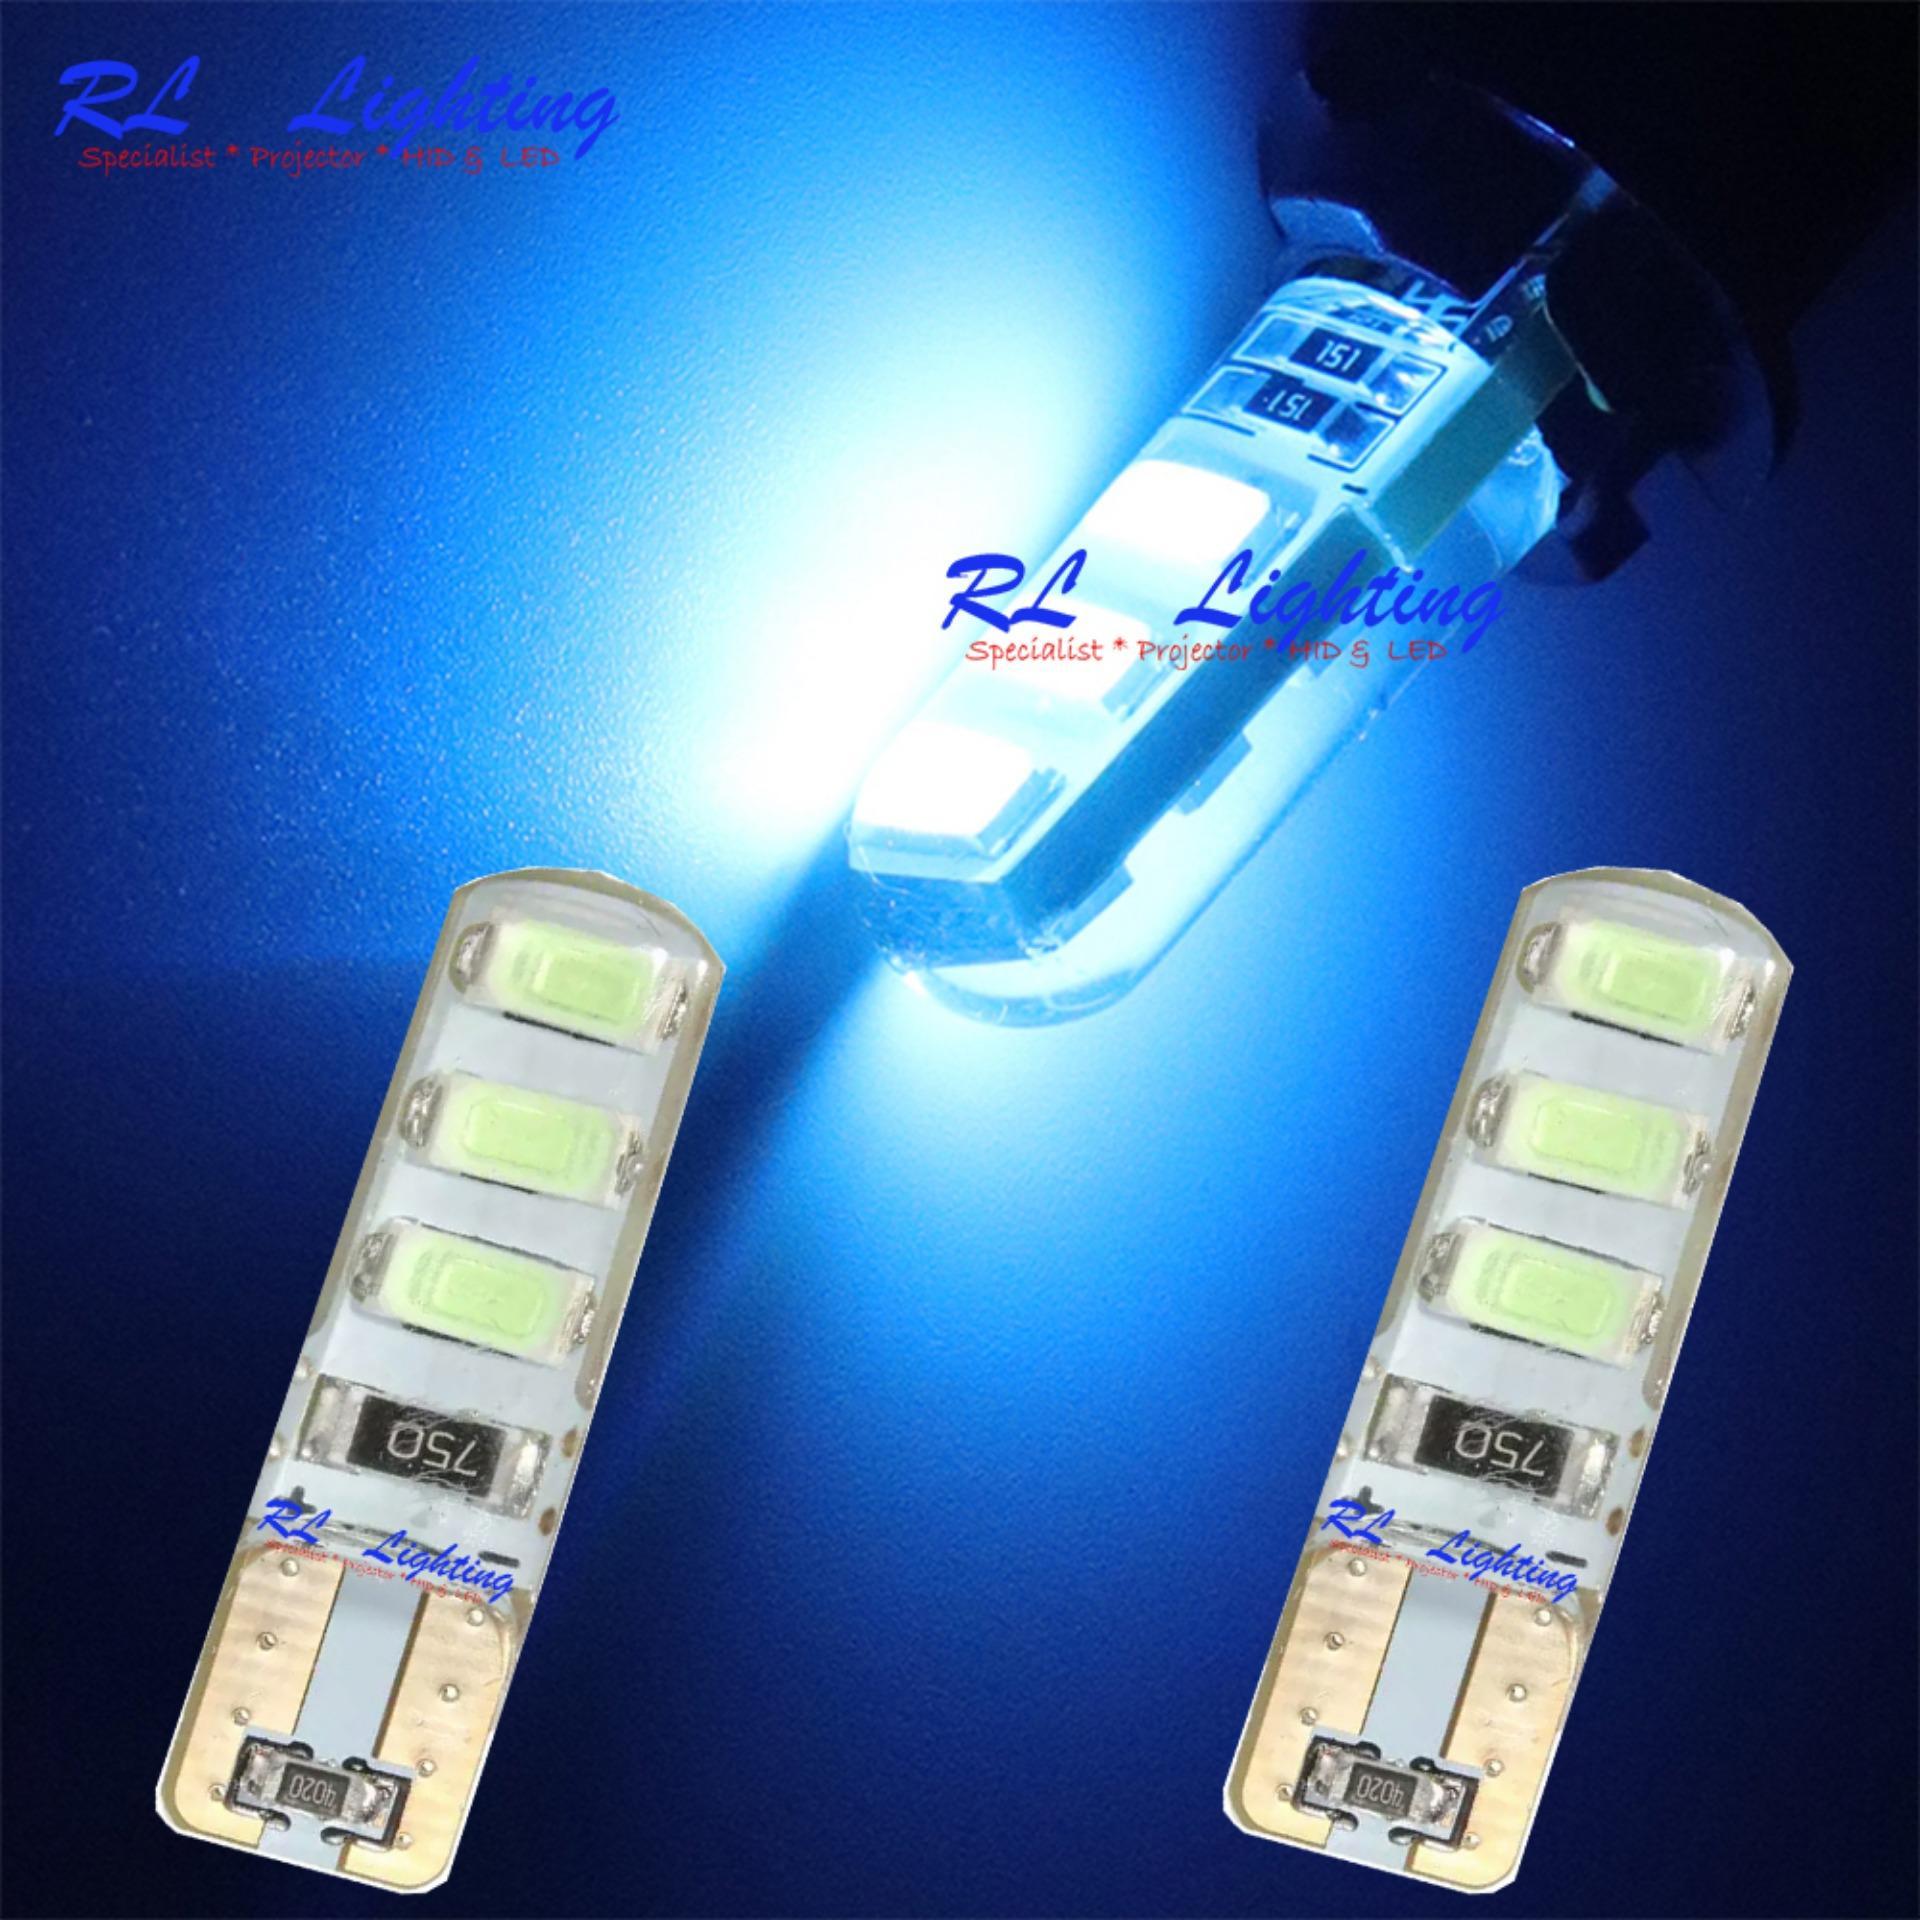 2bh Led T10 Senja 6Led Gel / Jelly / Silicone Super Bright - Ice Blue